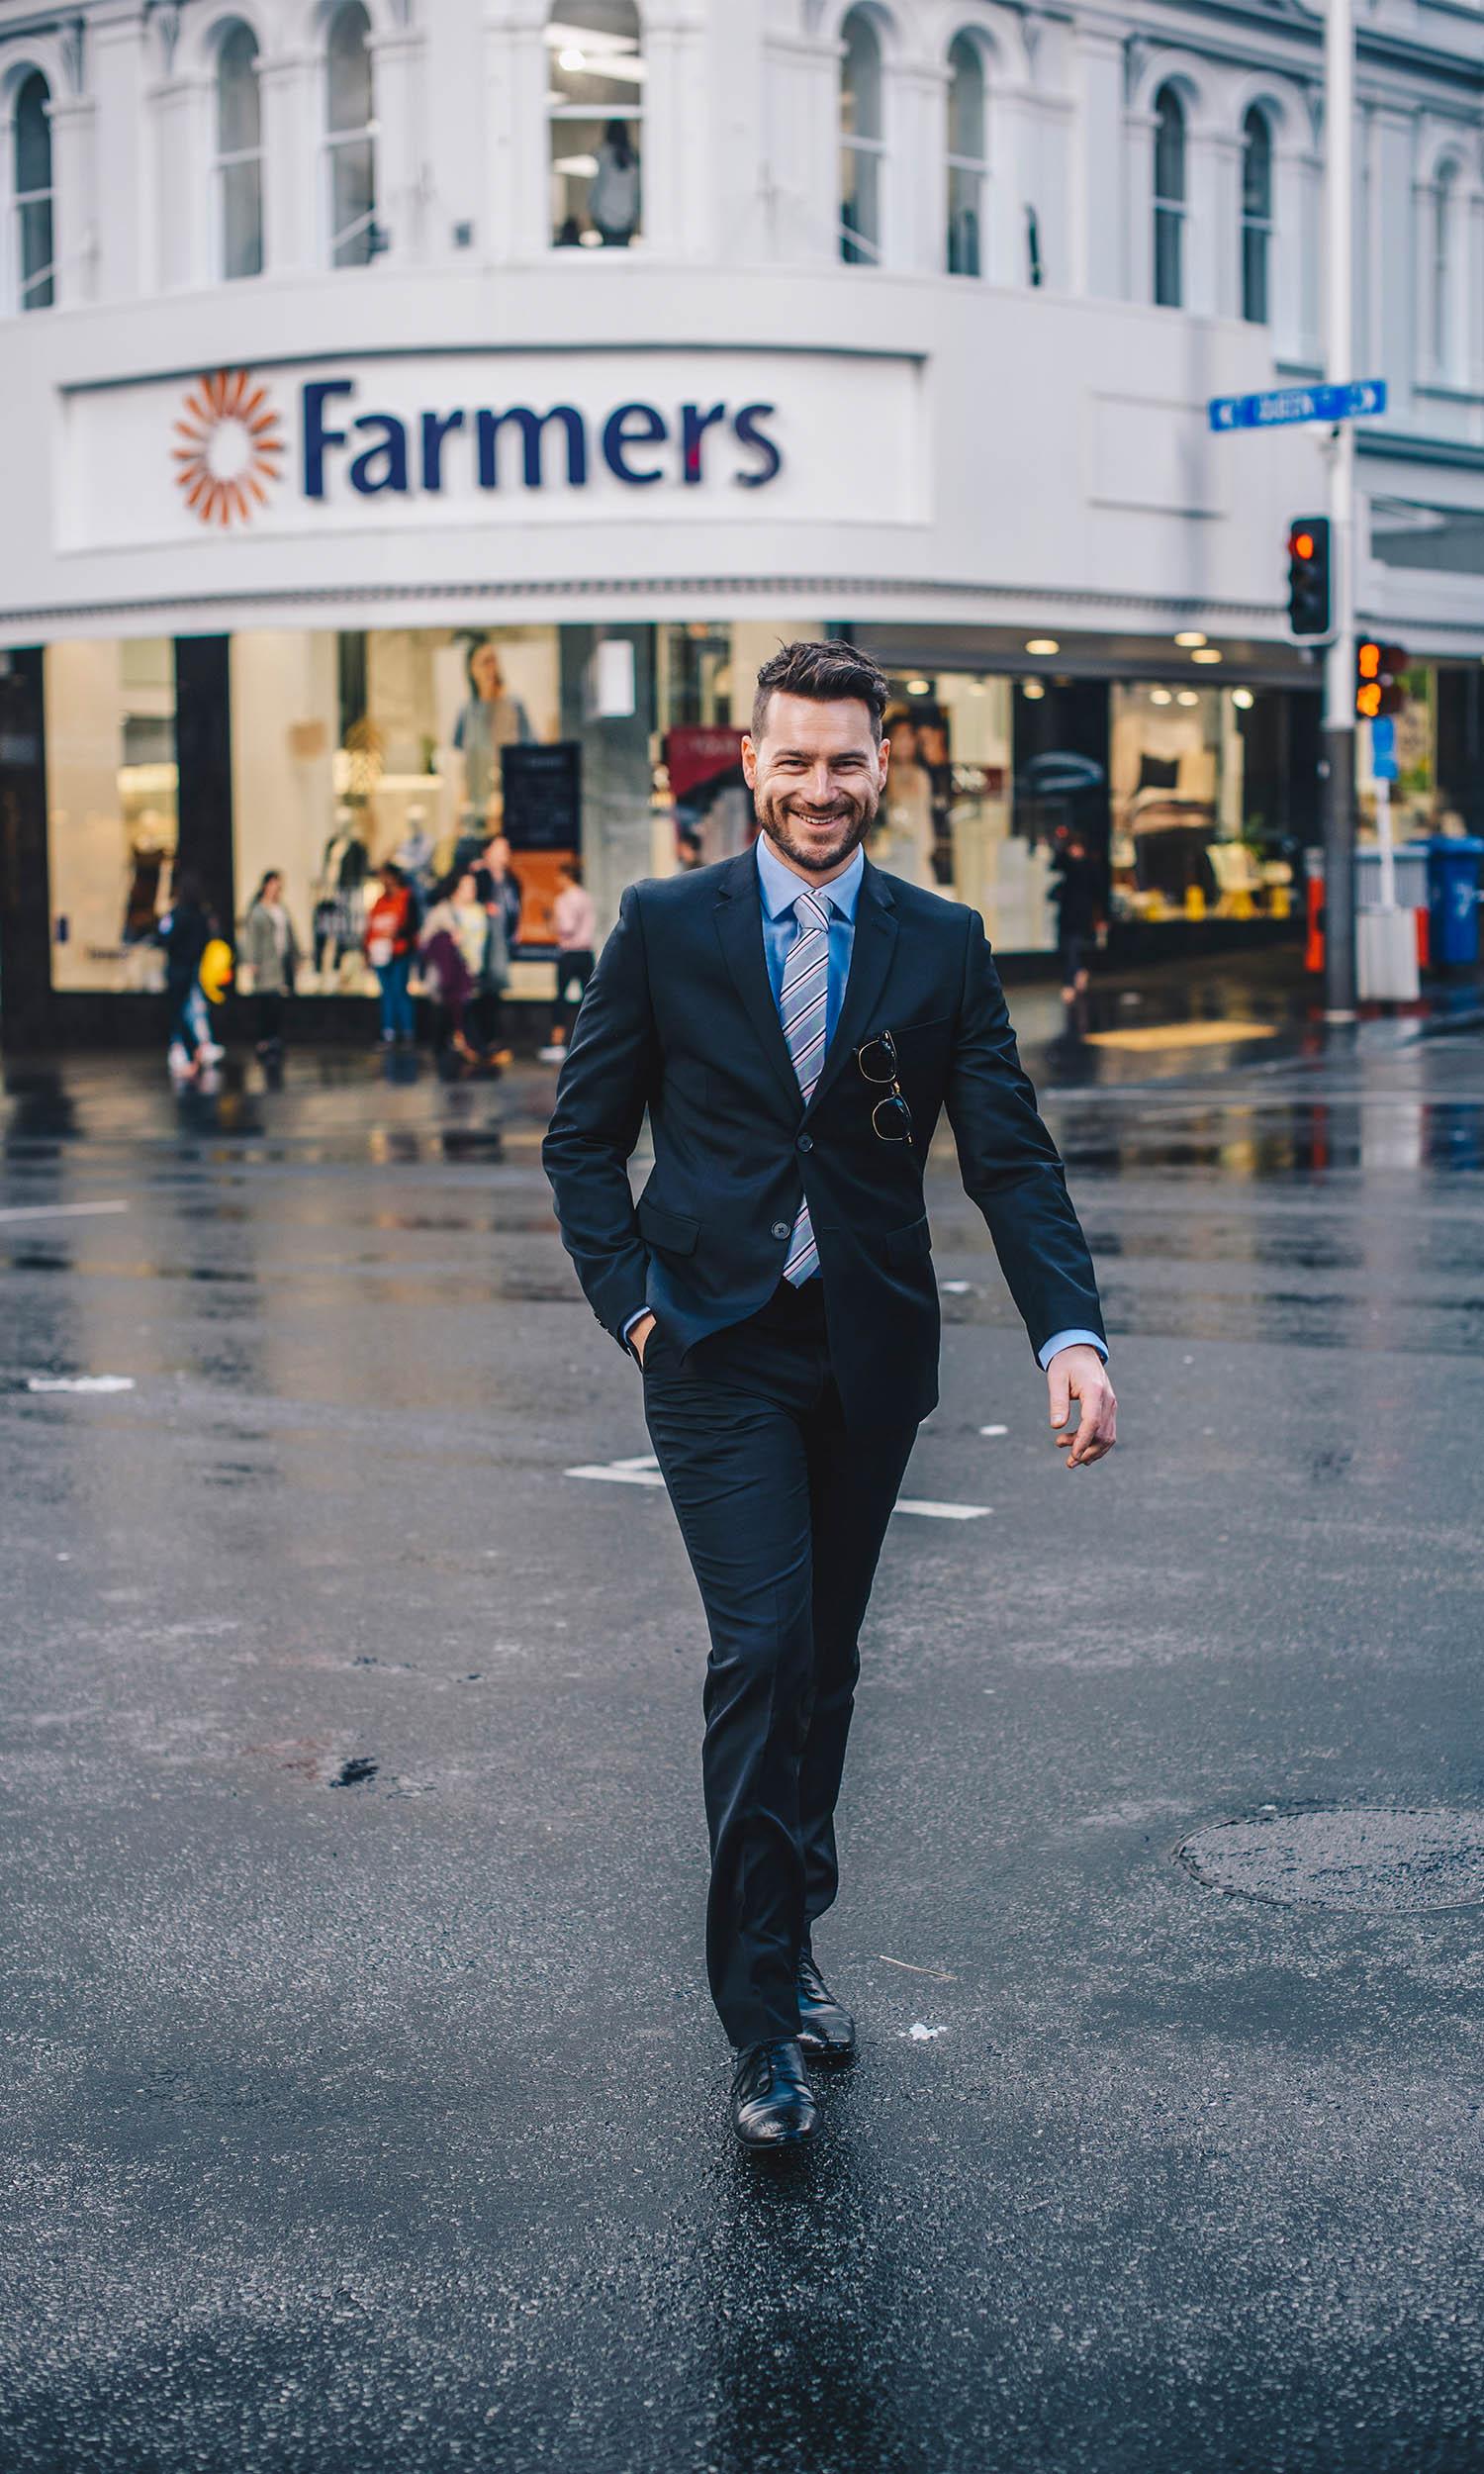 jaheb_barnett_new_zealand_fashion_blogger_farmers_calvin_klein